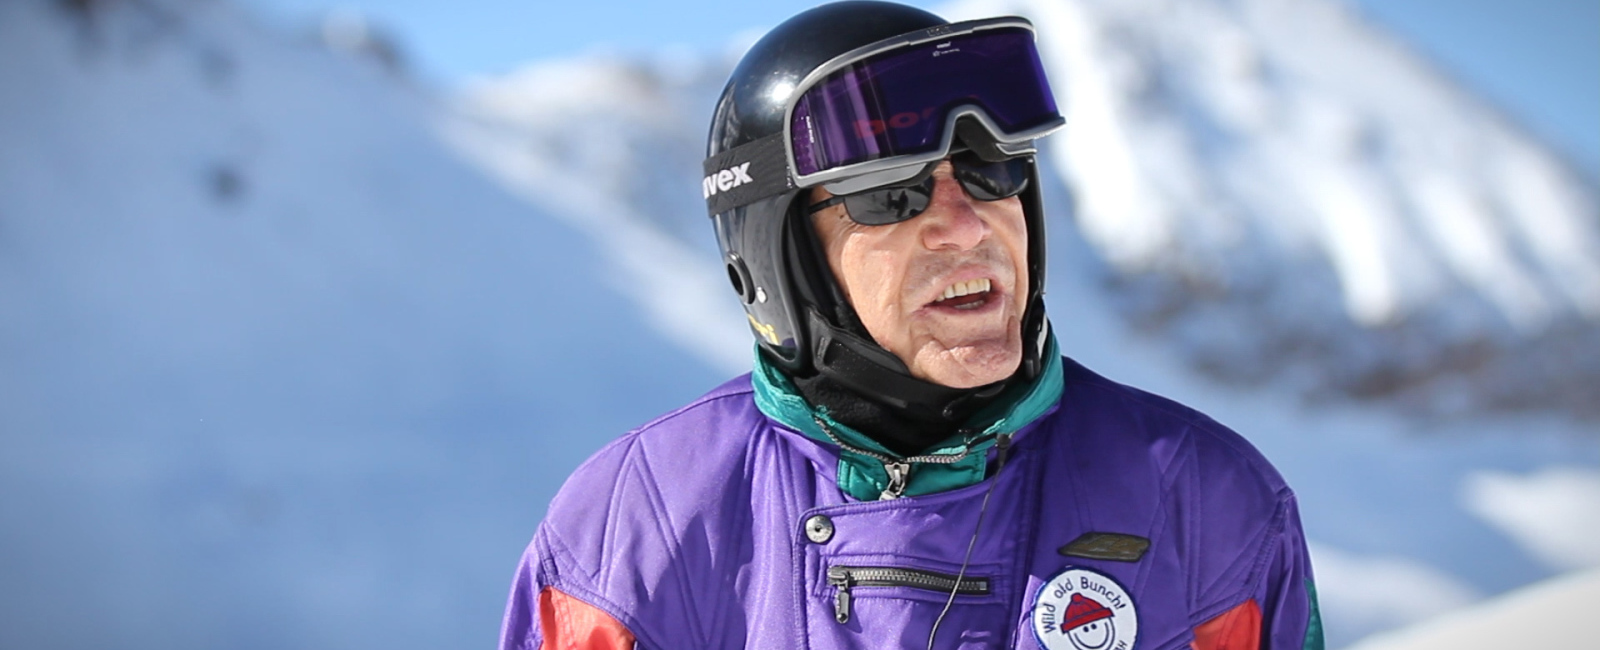 98-Year-Old Skier George - The Powder Philosophy